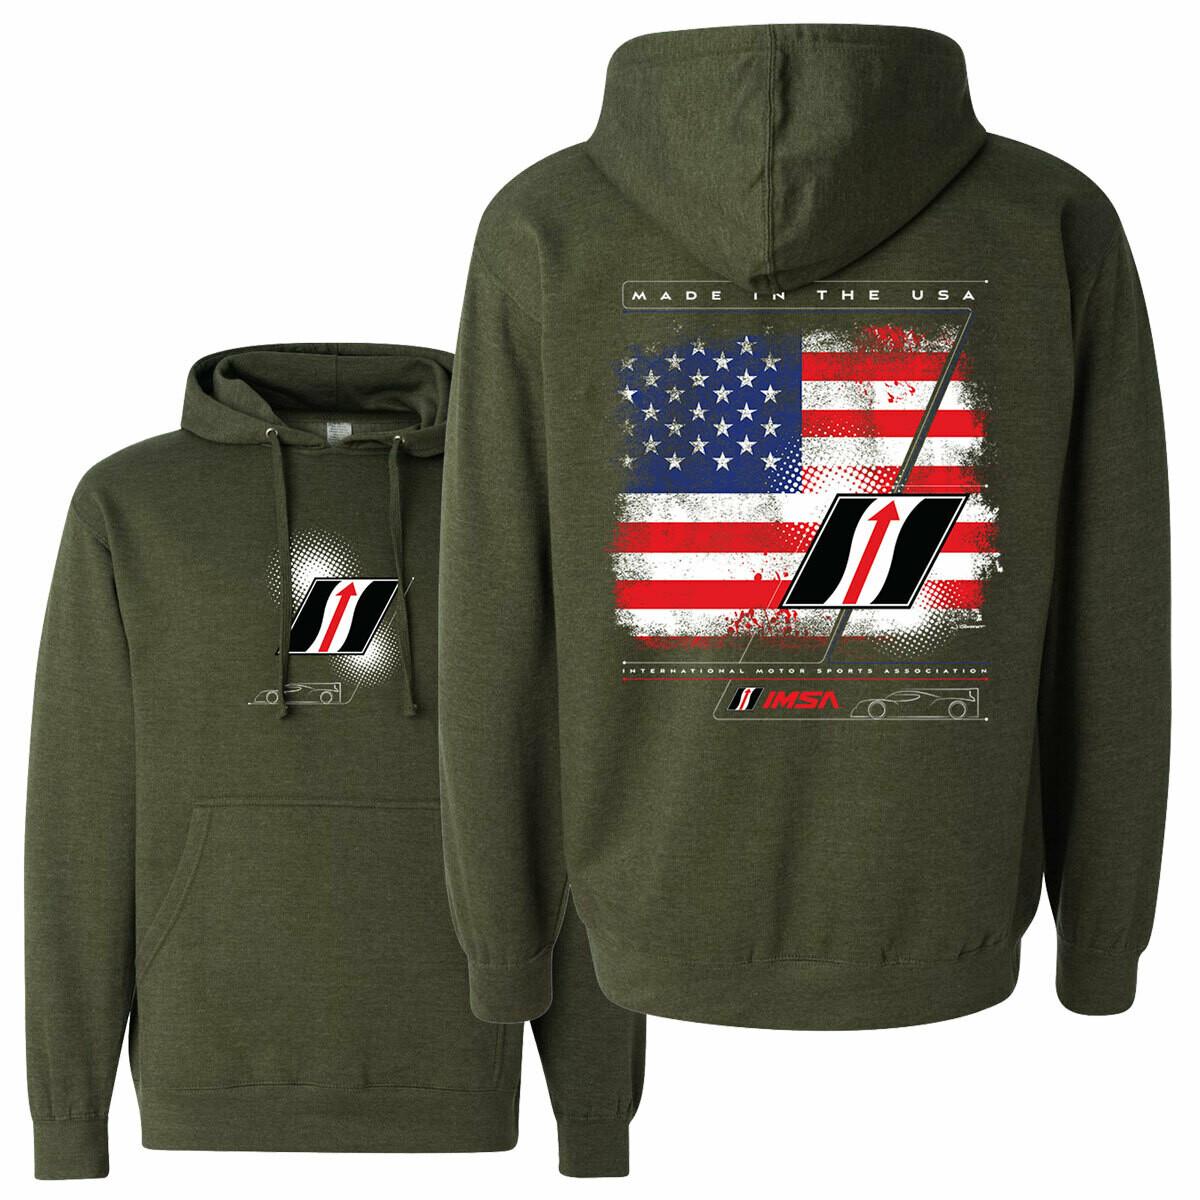 IMSA 2020 Flag & Apex Hooded Sweatshirt -  Military Green